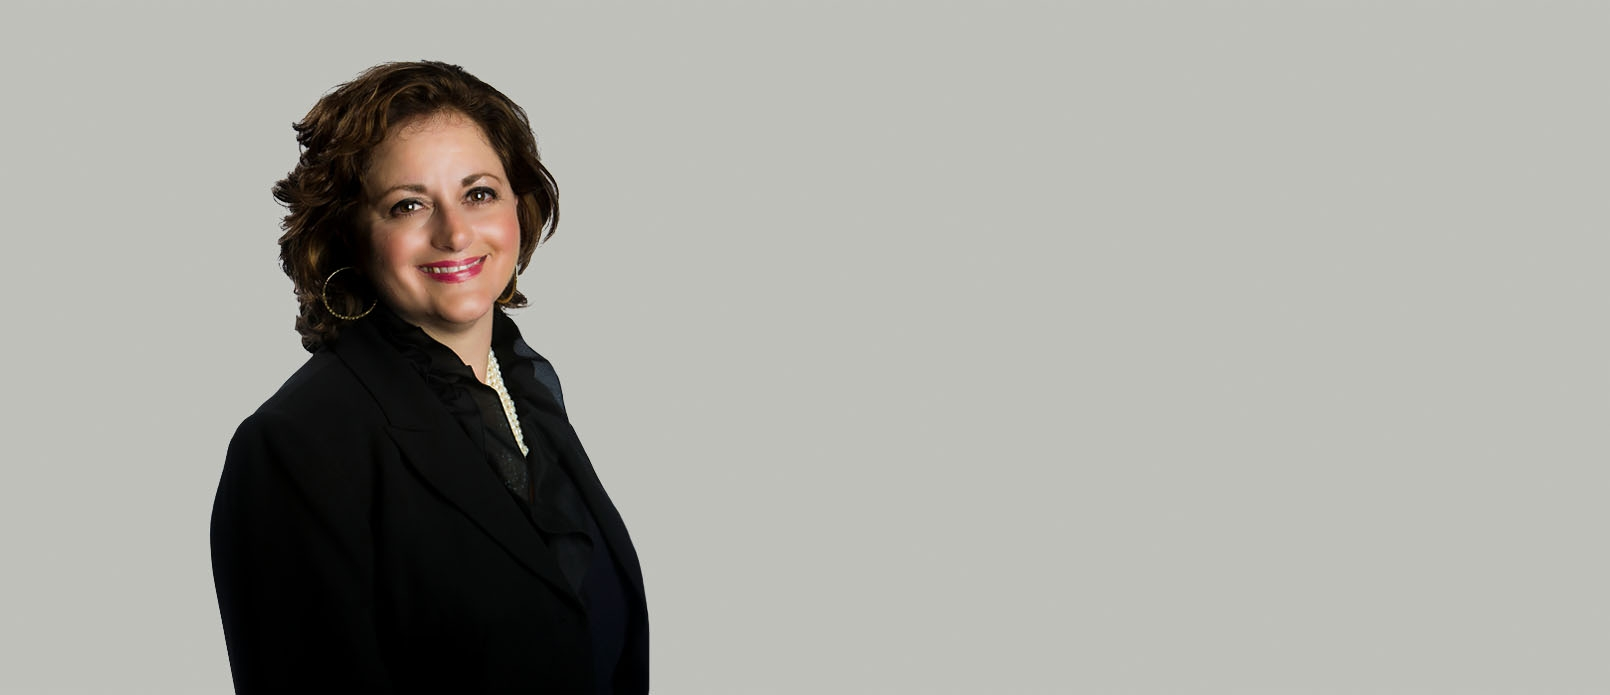 Anita Kidd